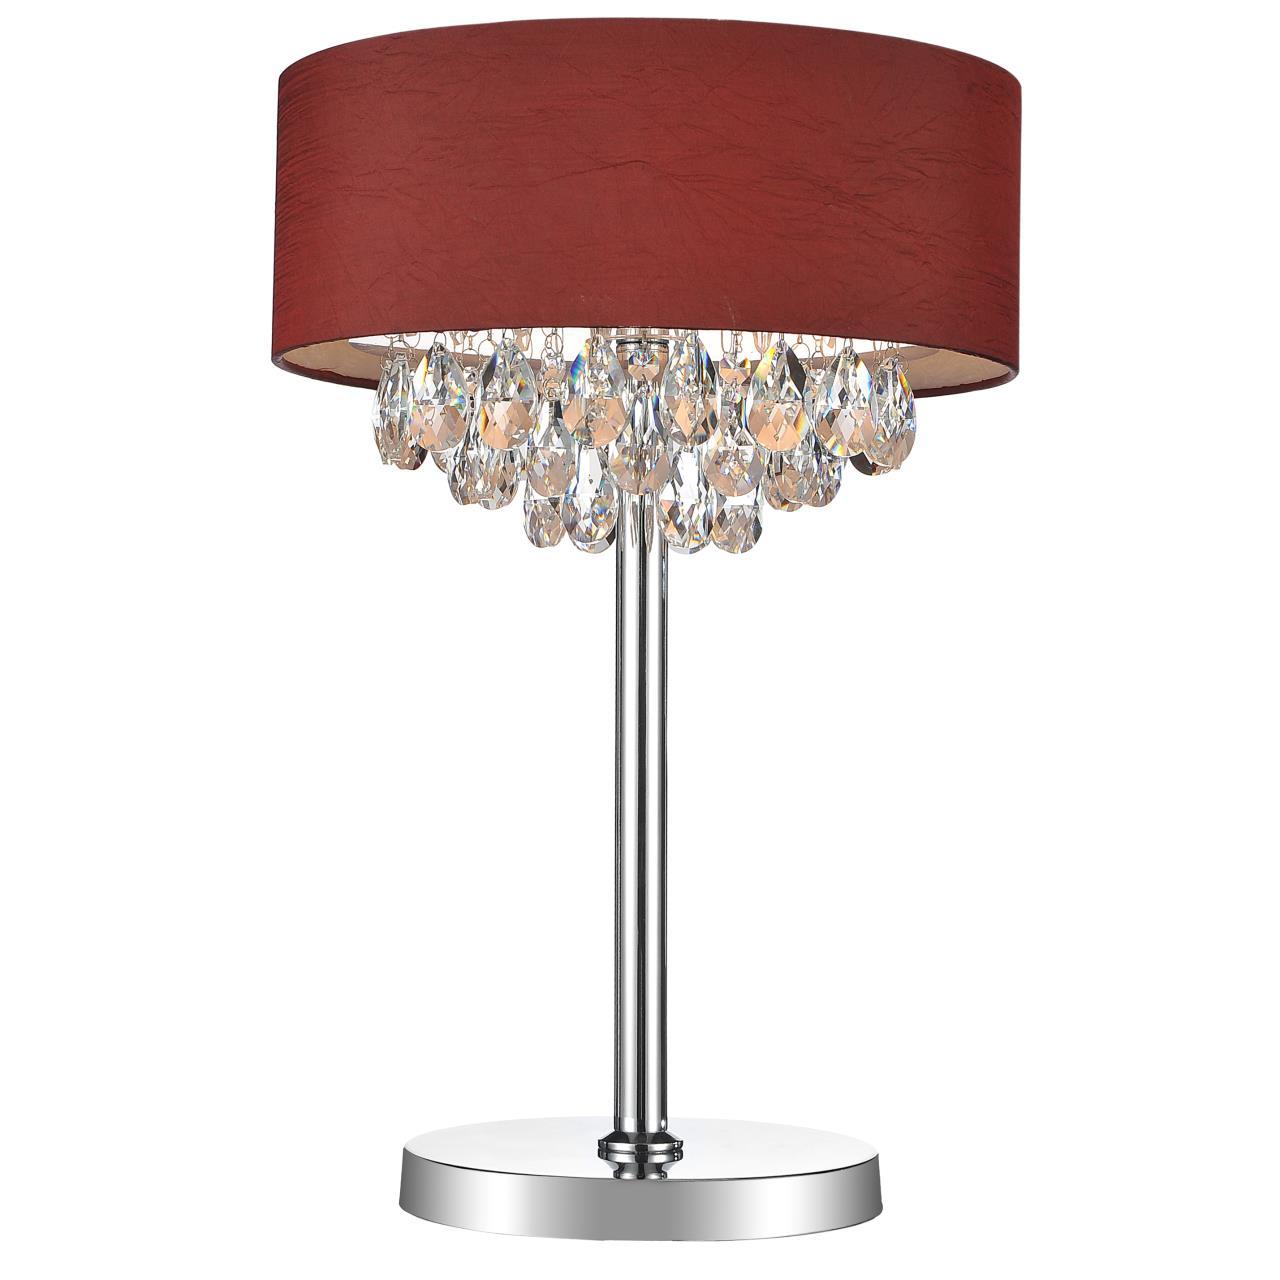 "Brizzo Lighting Stores. 14"" Struttura Modern Crystal Round"